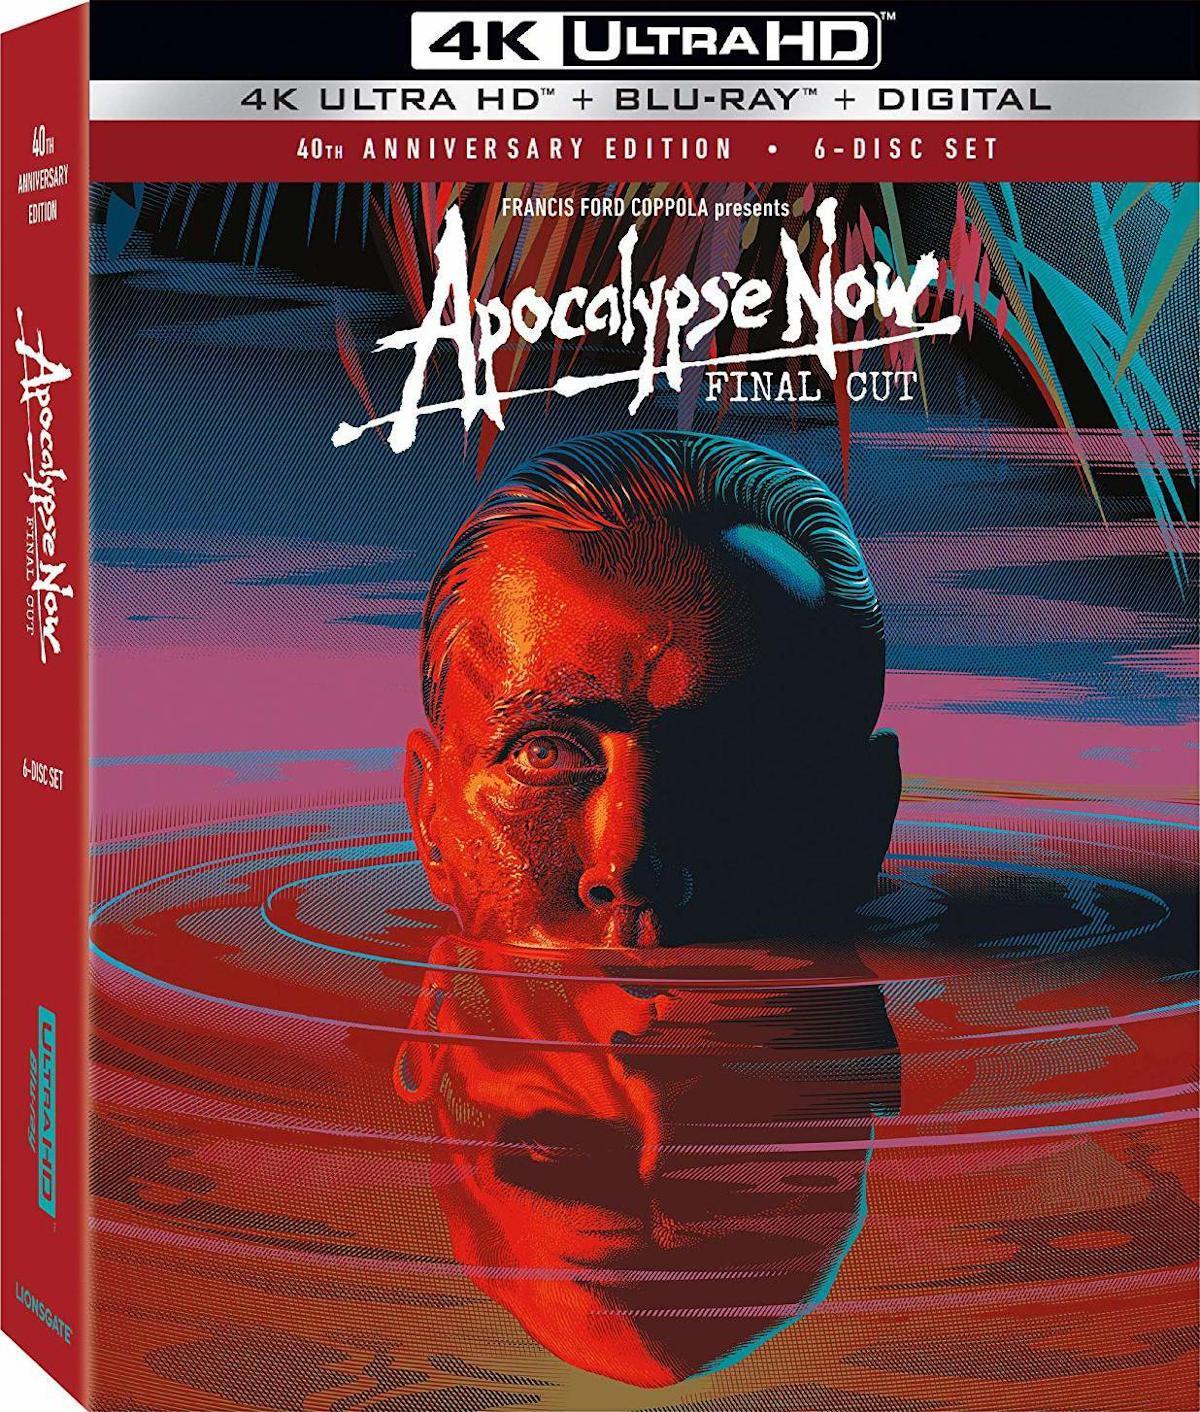 Apocalypse Now 4K UHD - Best 4K Blu-ray Horror Triller Movies